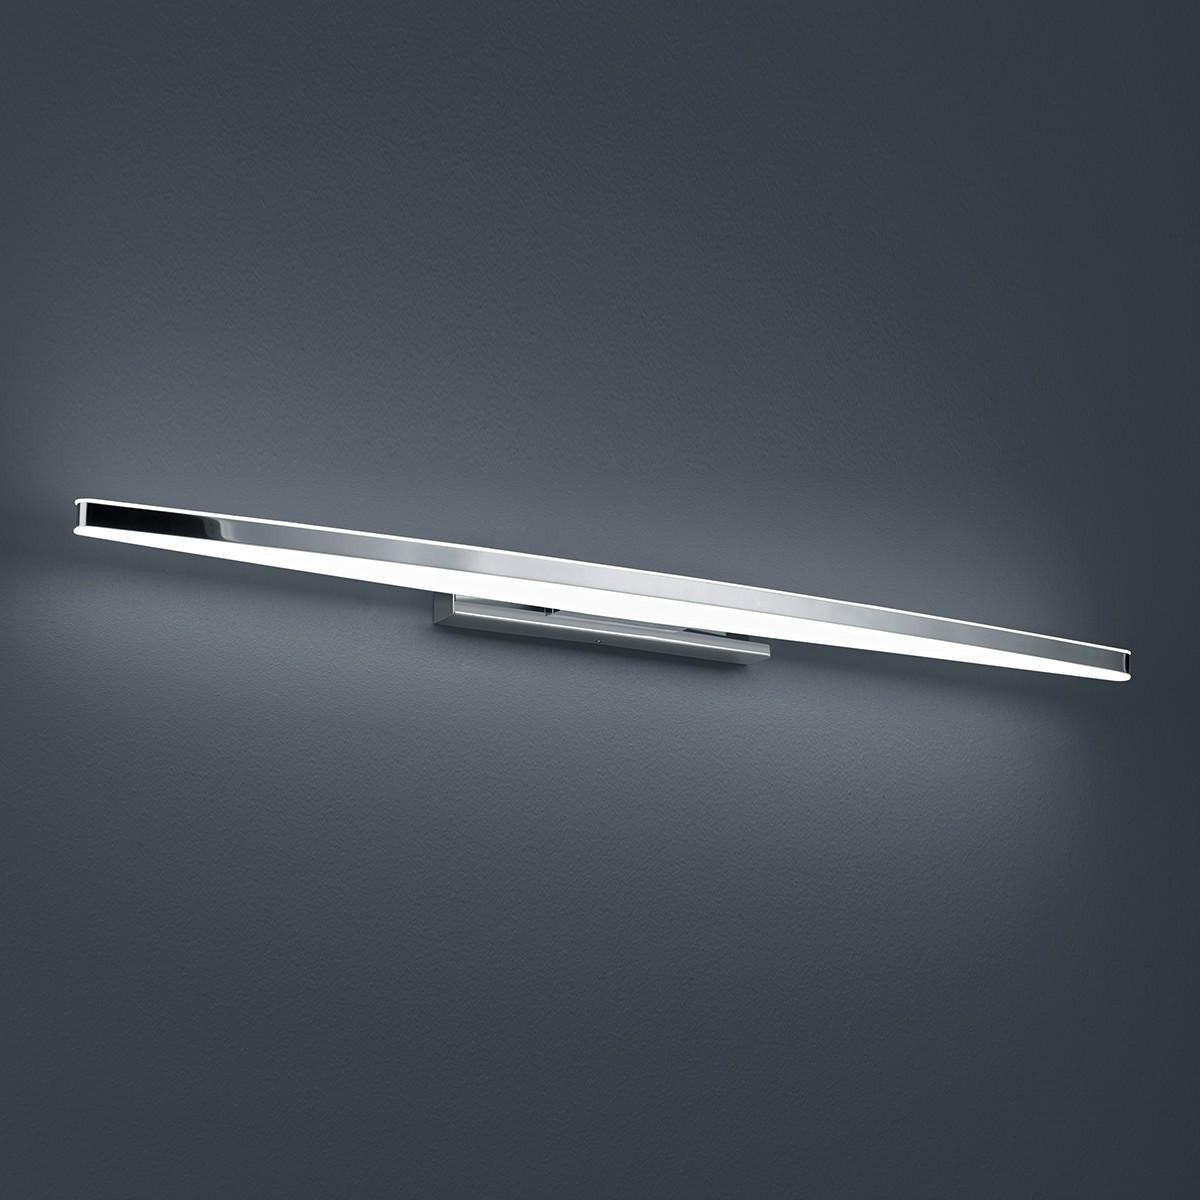 Helestra Argo Wandleuchte, Länge: 80 cm, Chrom - Acrylglas satiniert